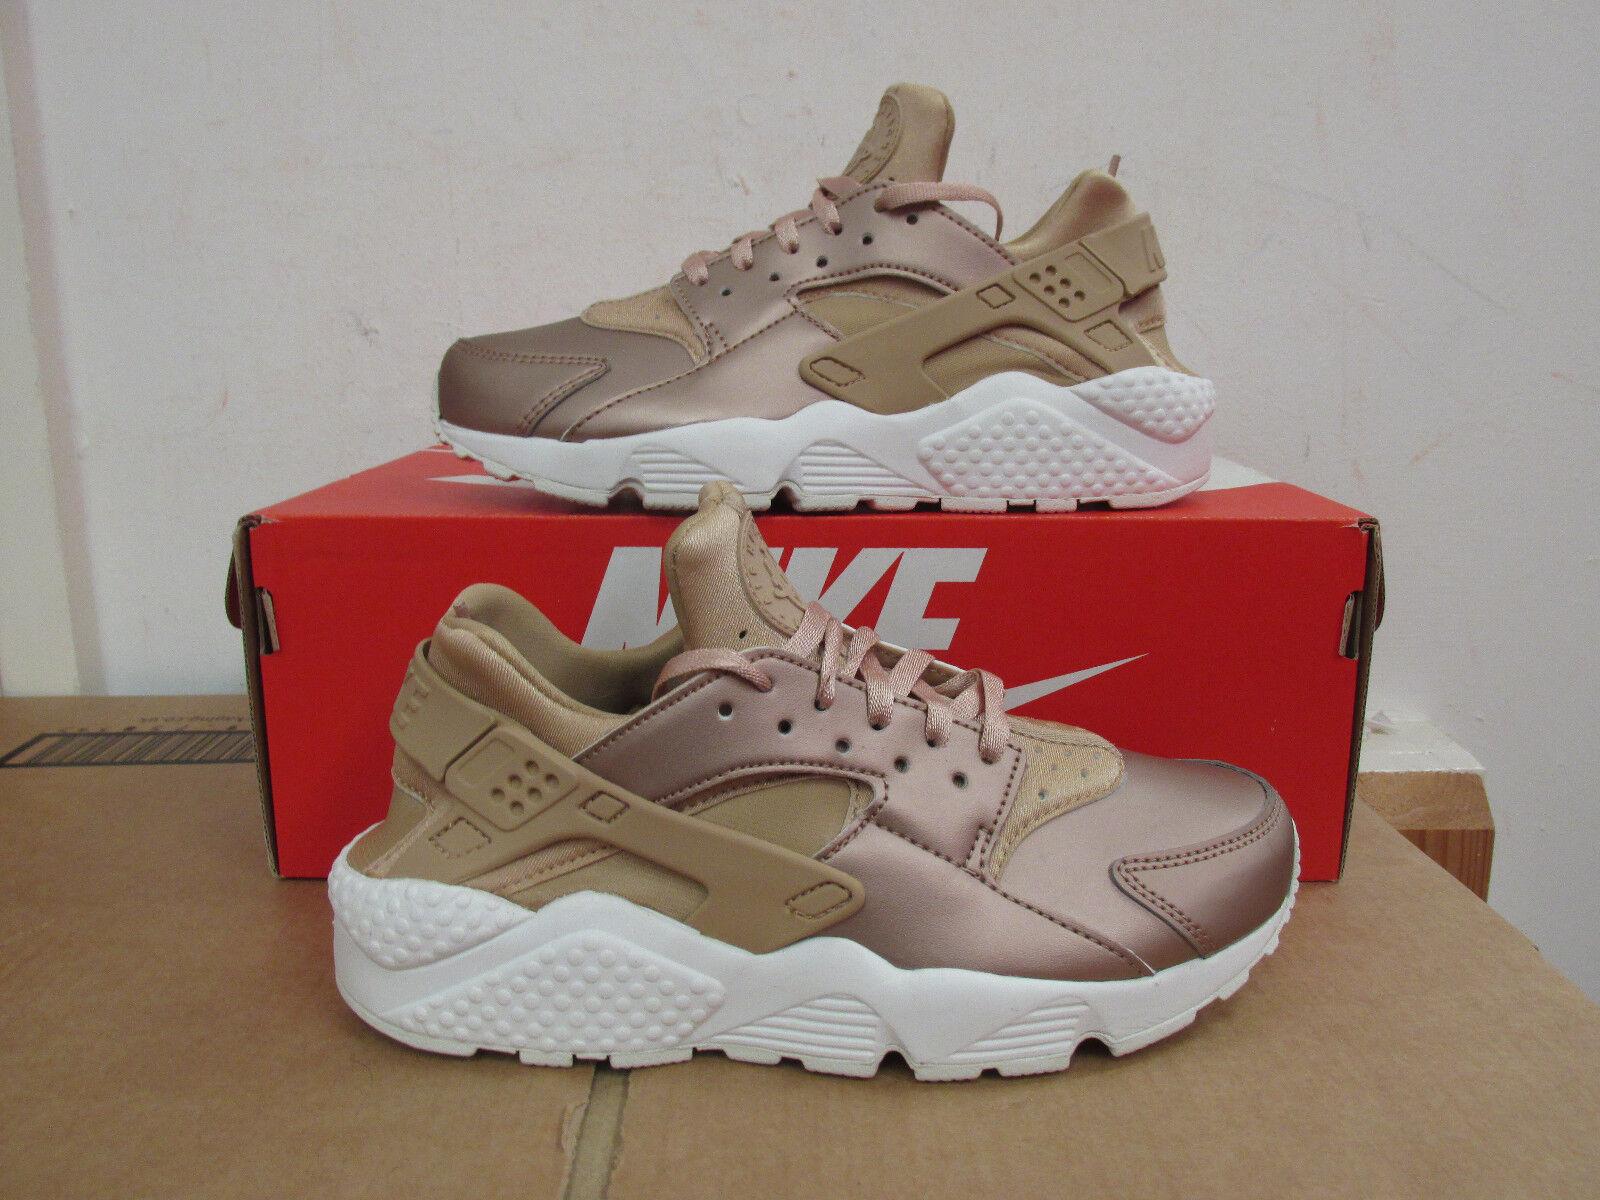 Nike Air huarache Run running Prem txt mujer aa0523 running Run Trainers clearance 008d6e